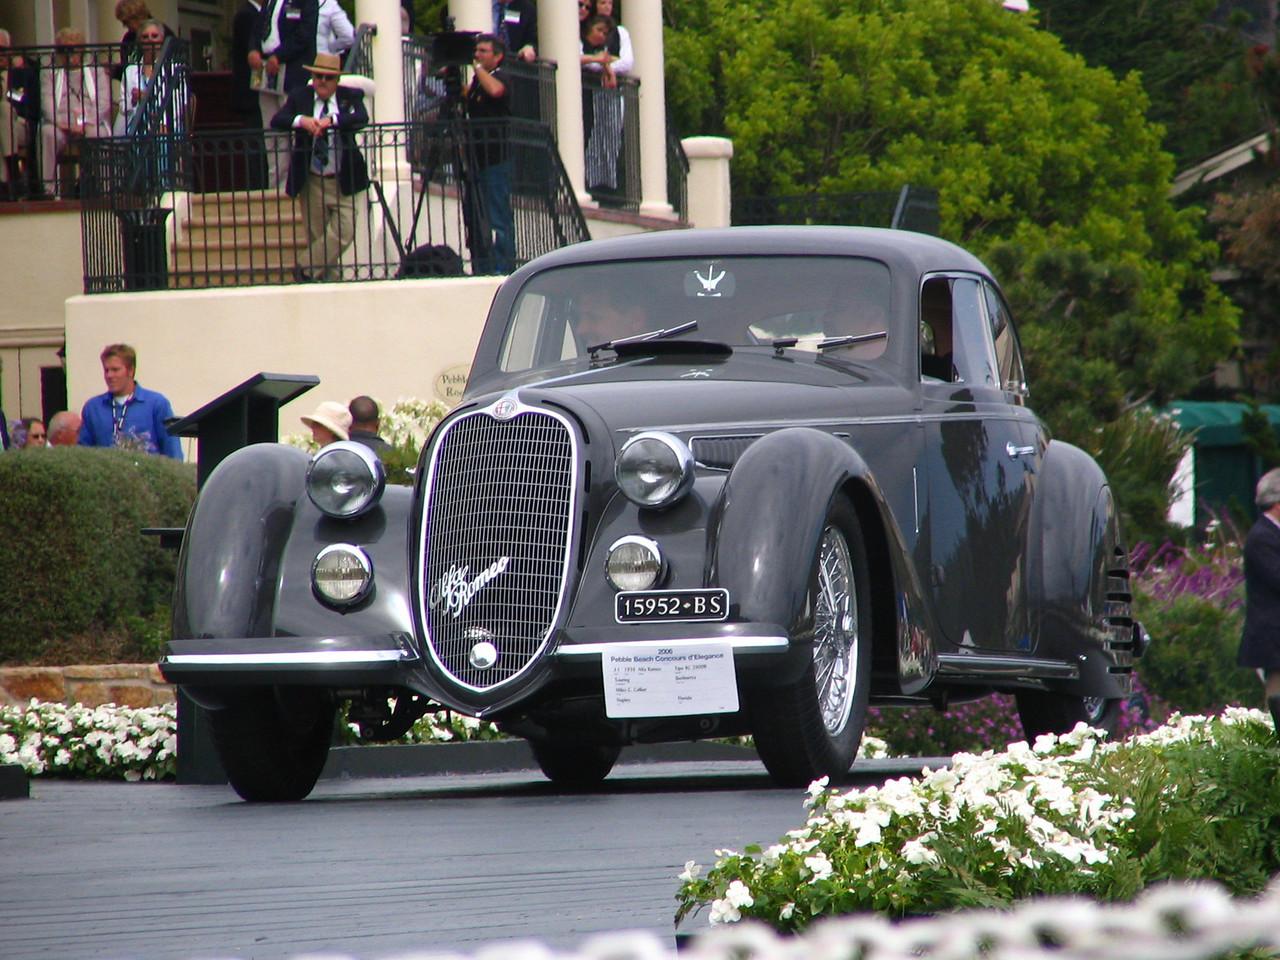 Class J-1, European Classic 1925-1939 Closed, Winner and Elegance in Motion Trophy Winner -- 1938 Alfa Romeo Tipo 8C 2900B Touring Berlinetta